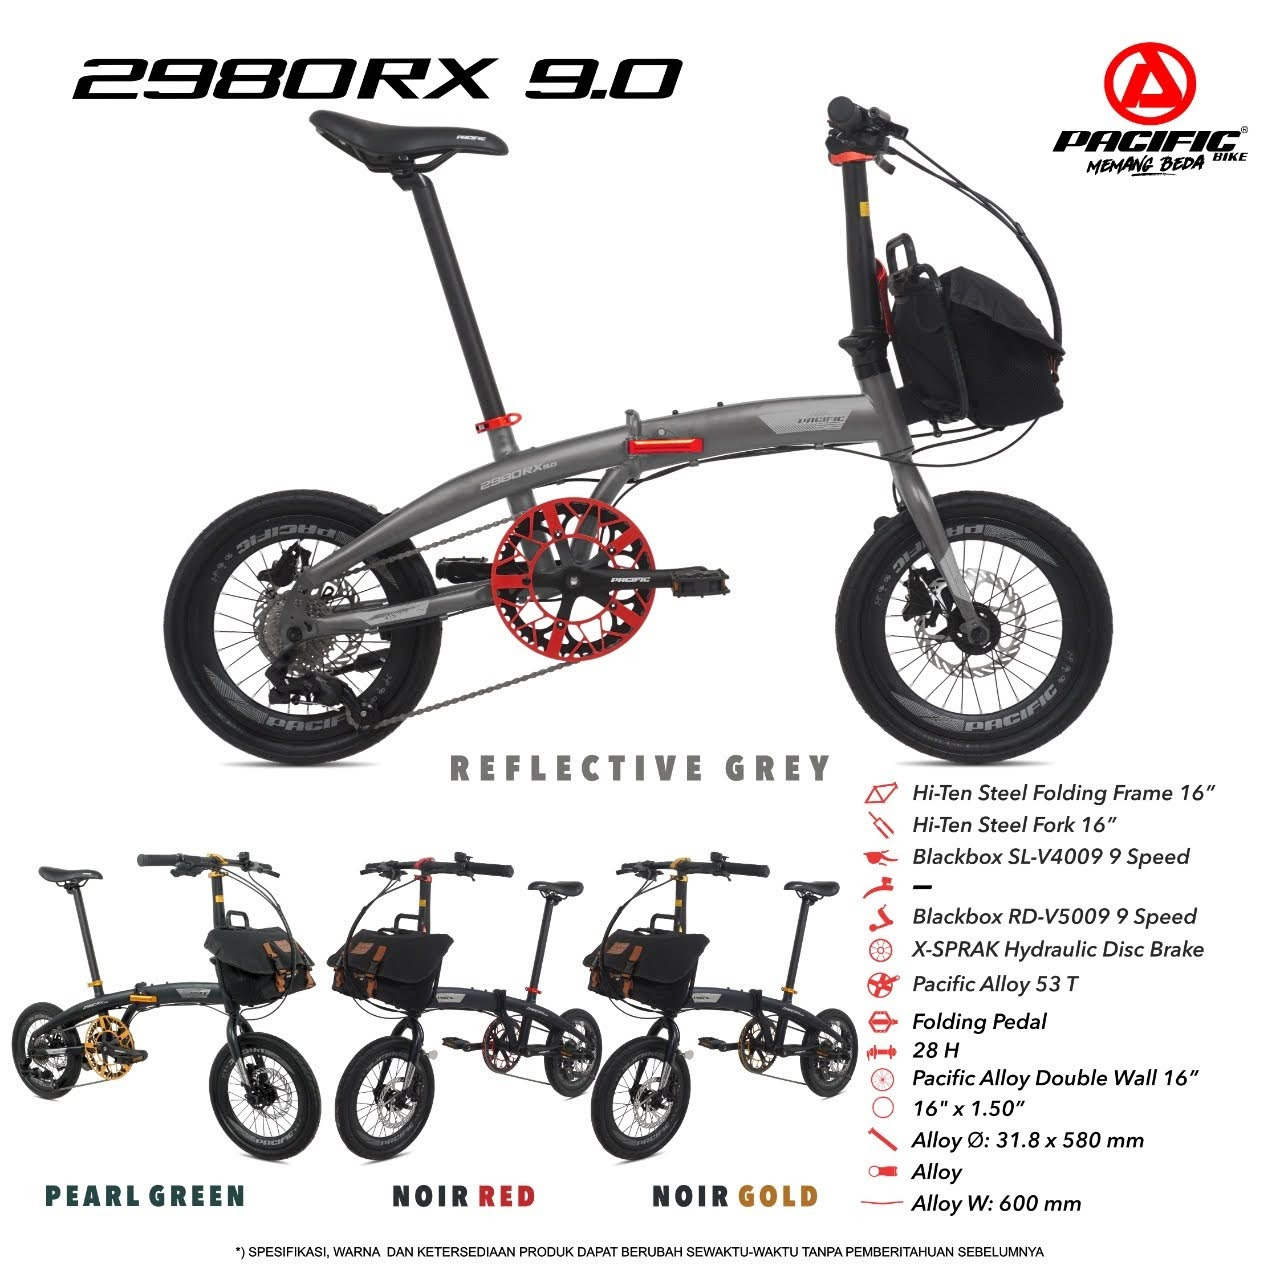 Tokosarana Mahasarana Sukses Sepeda Lipat Pacific 2980rx 9 0 16 X 1 50 Steel 1x9sp Hydraulic Disc Brake